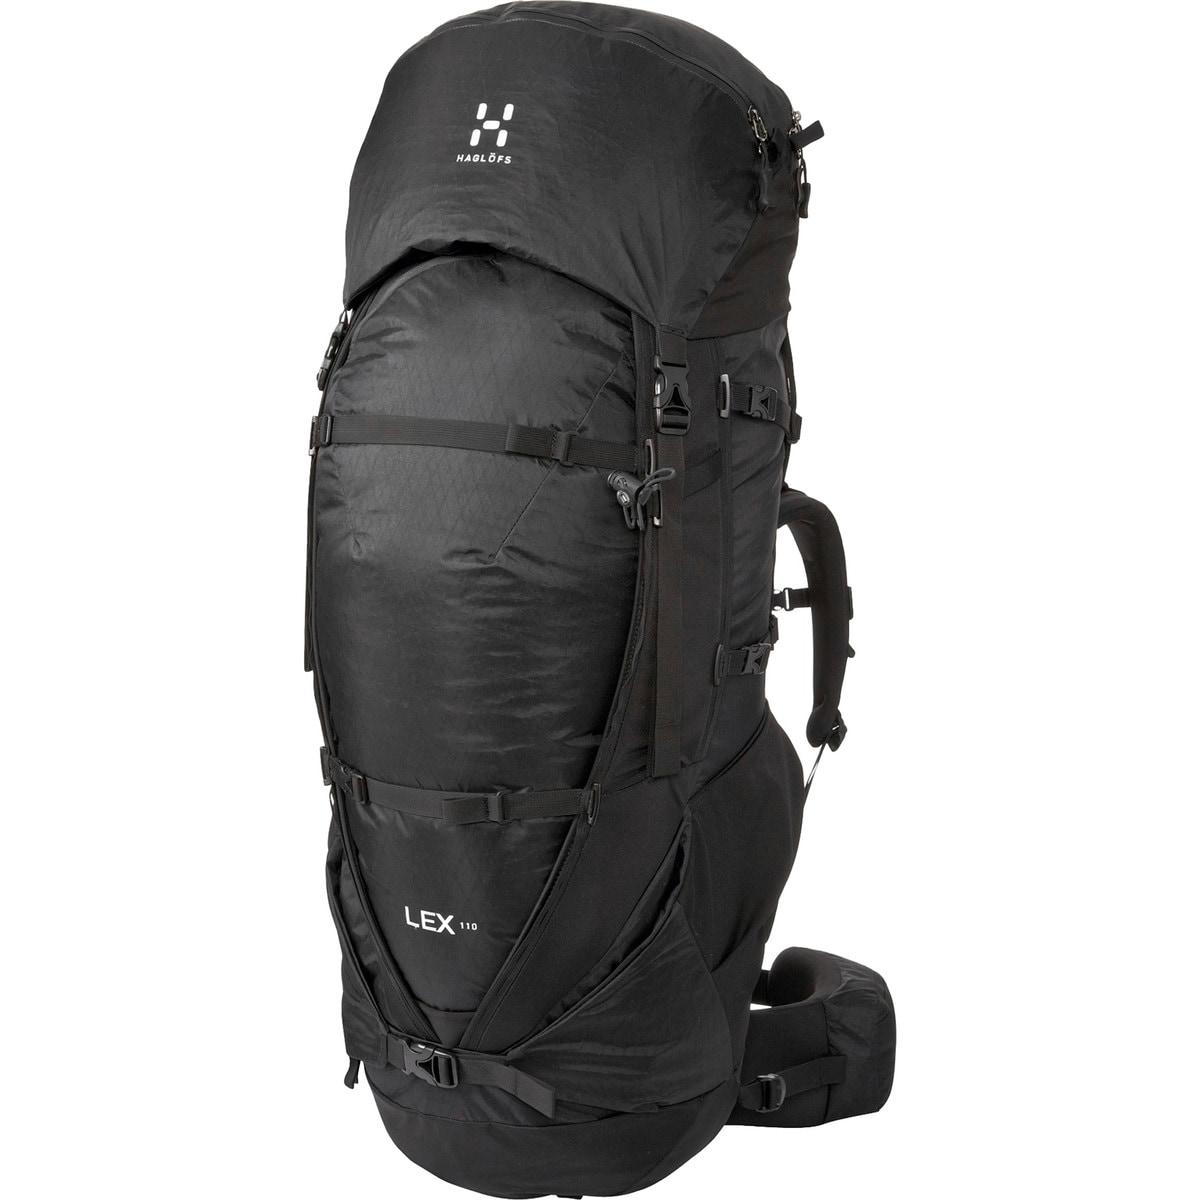 Haglofs Lex 110L Backpack True Black, One Size